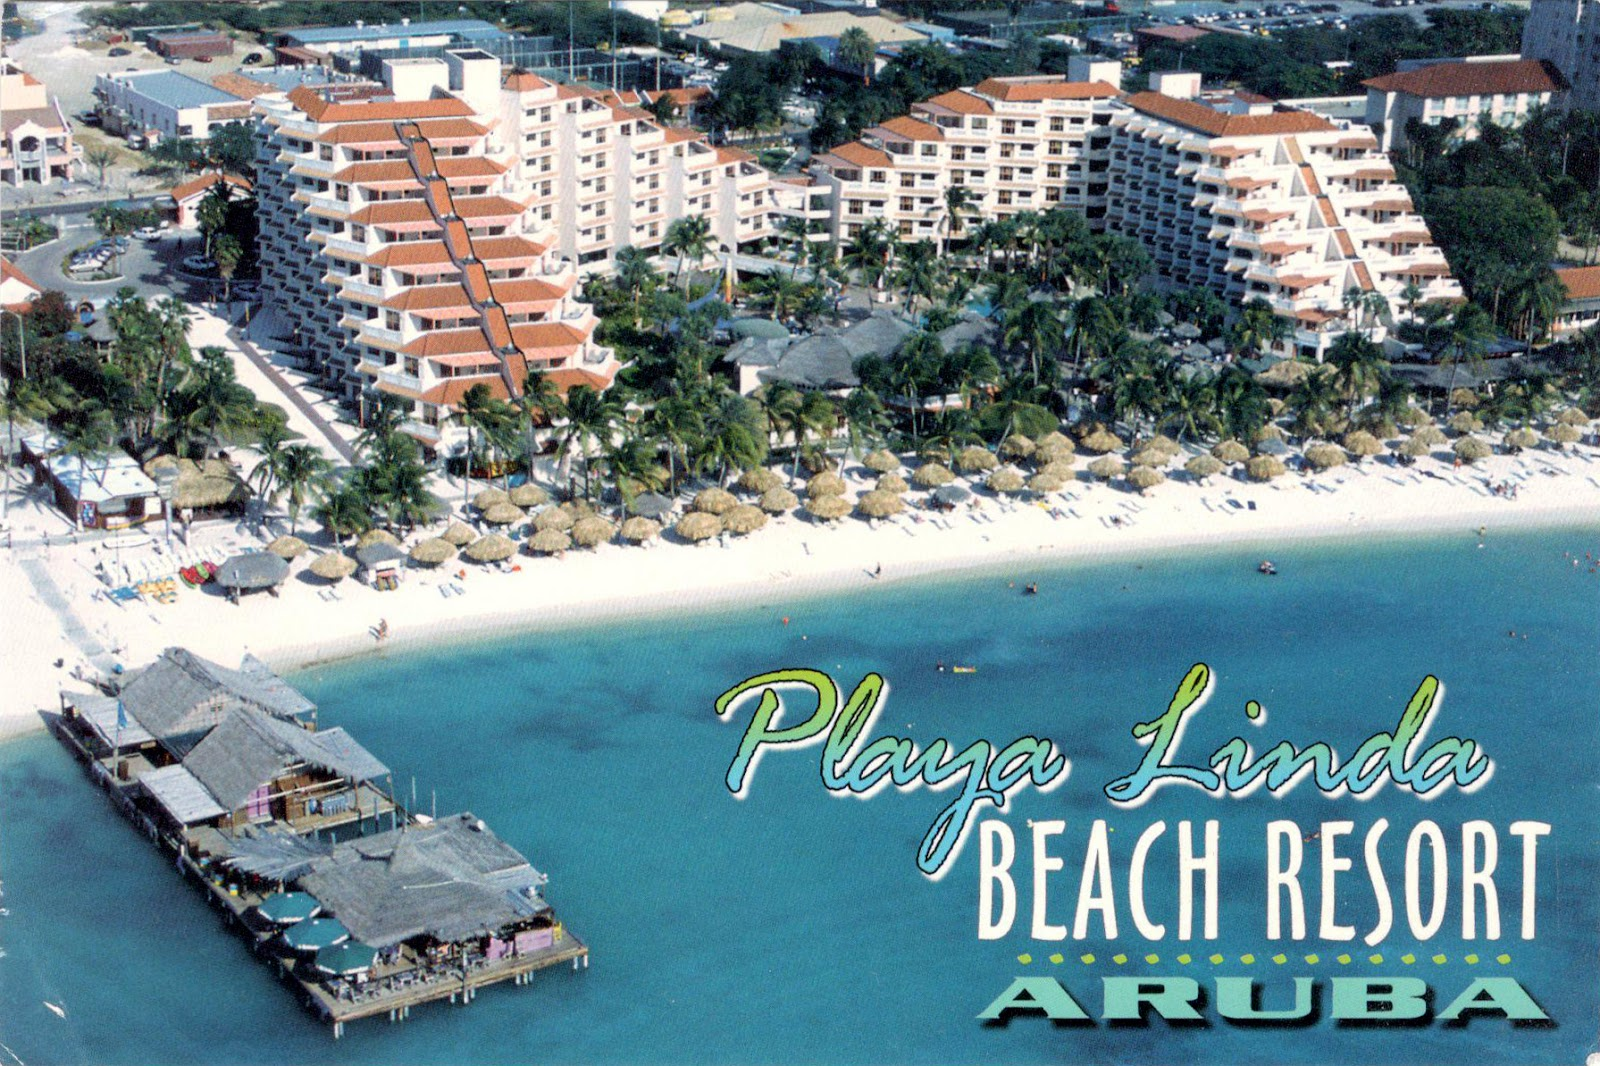 1716 Netherlands Aruba Playa Linda Beach Resort